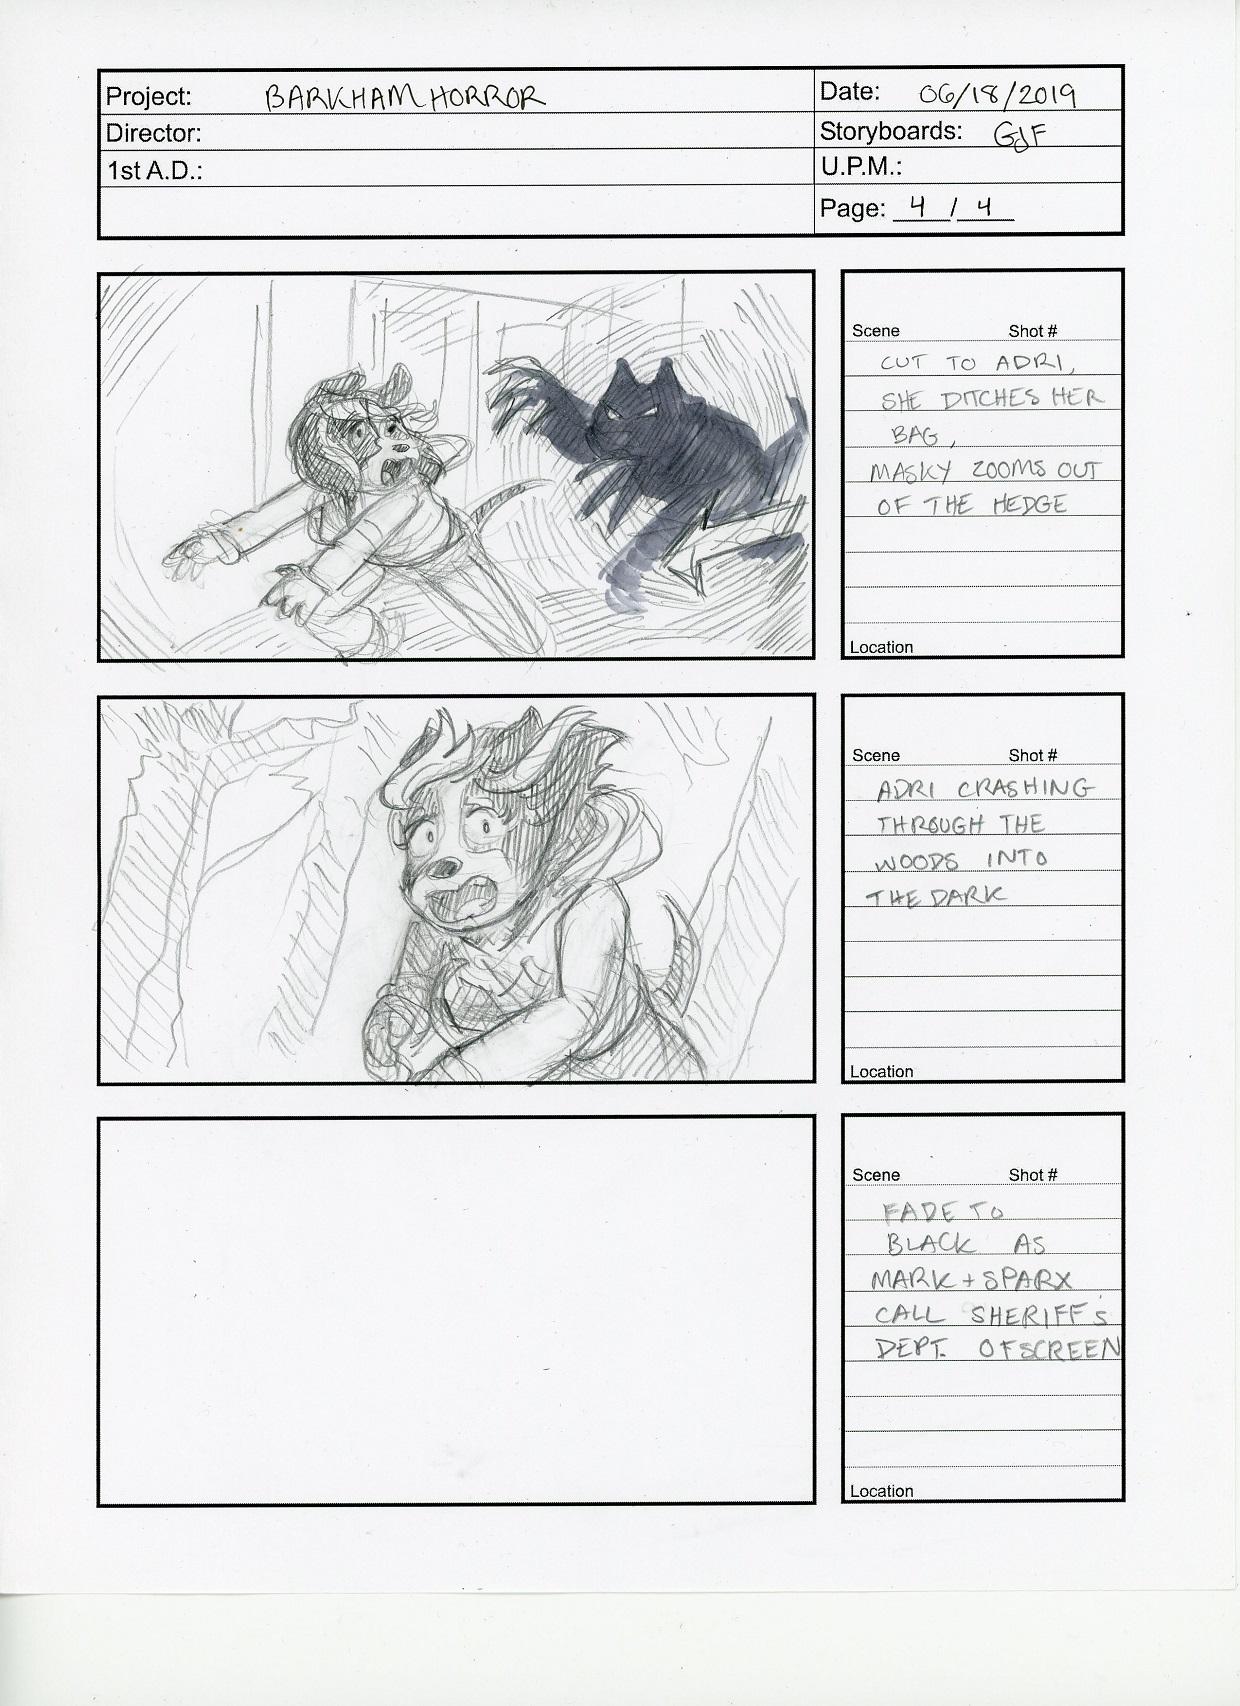 Extra: Storyboards 4/4